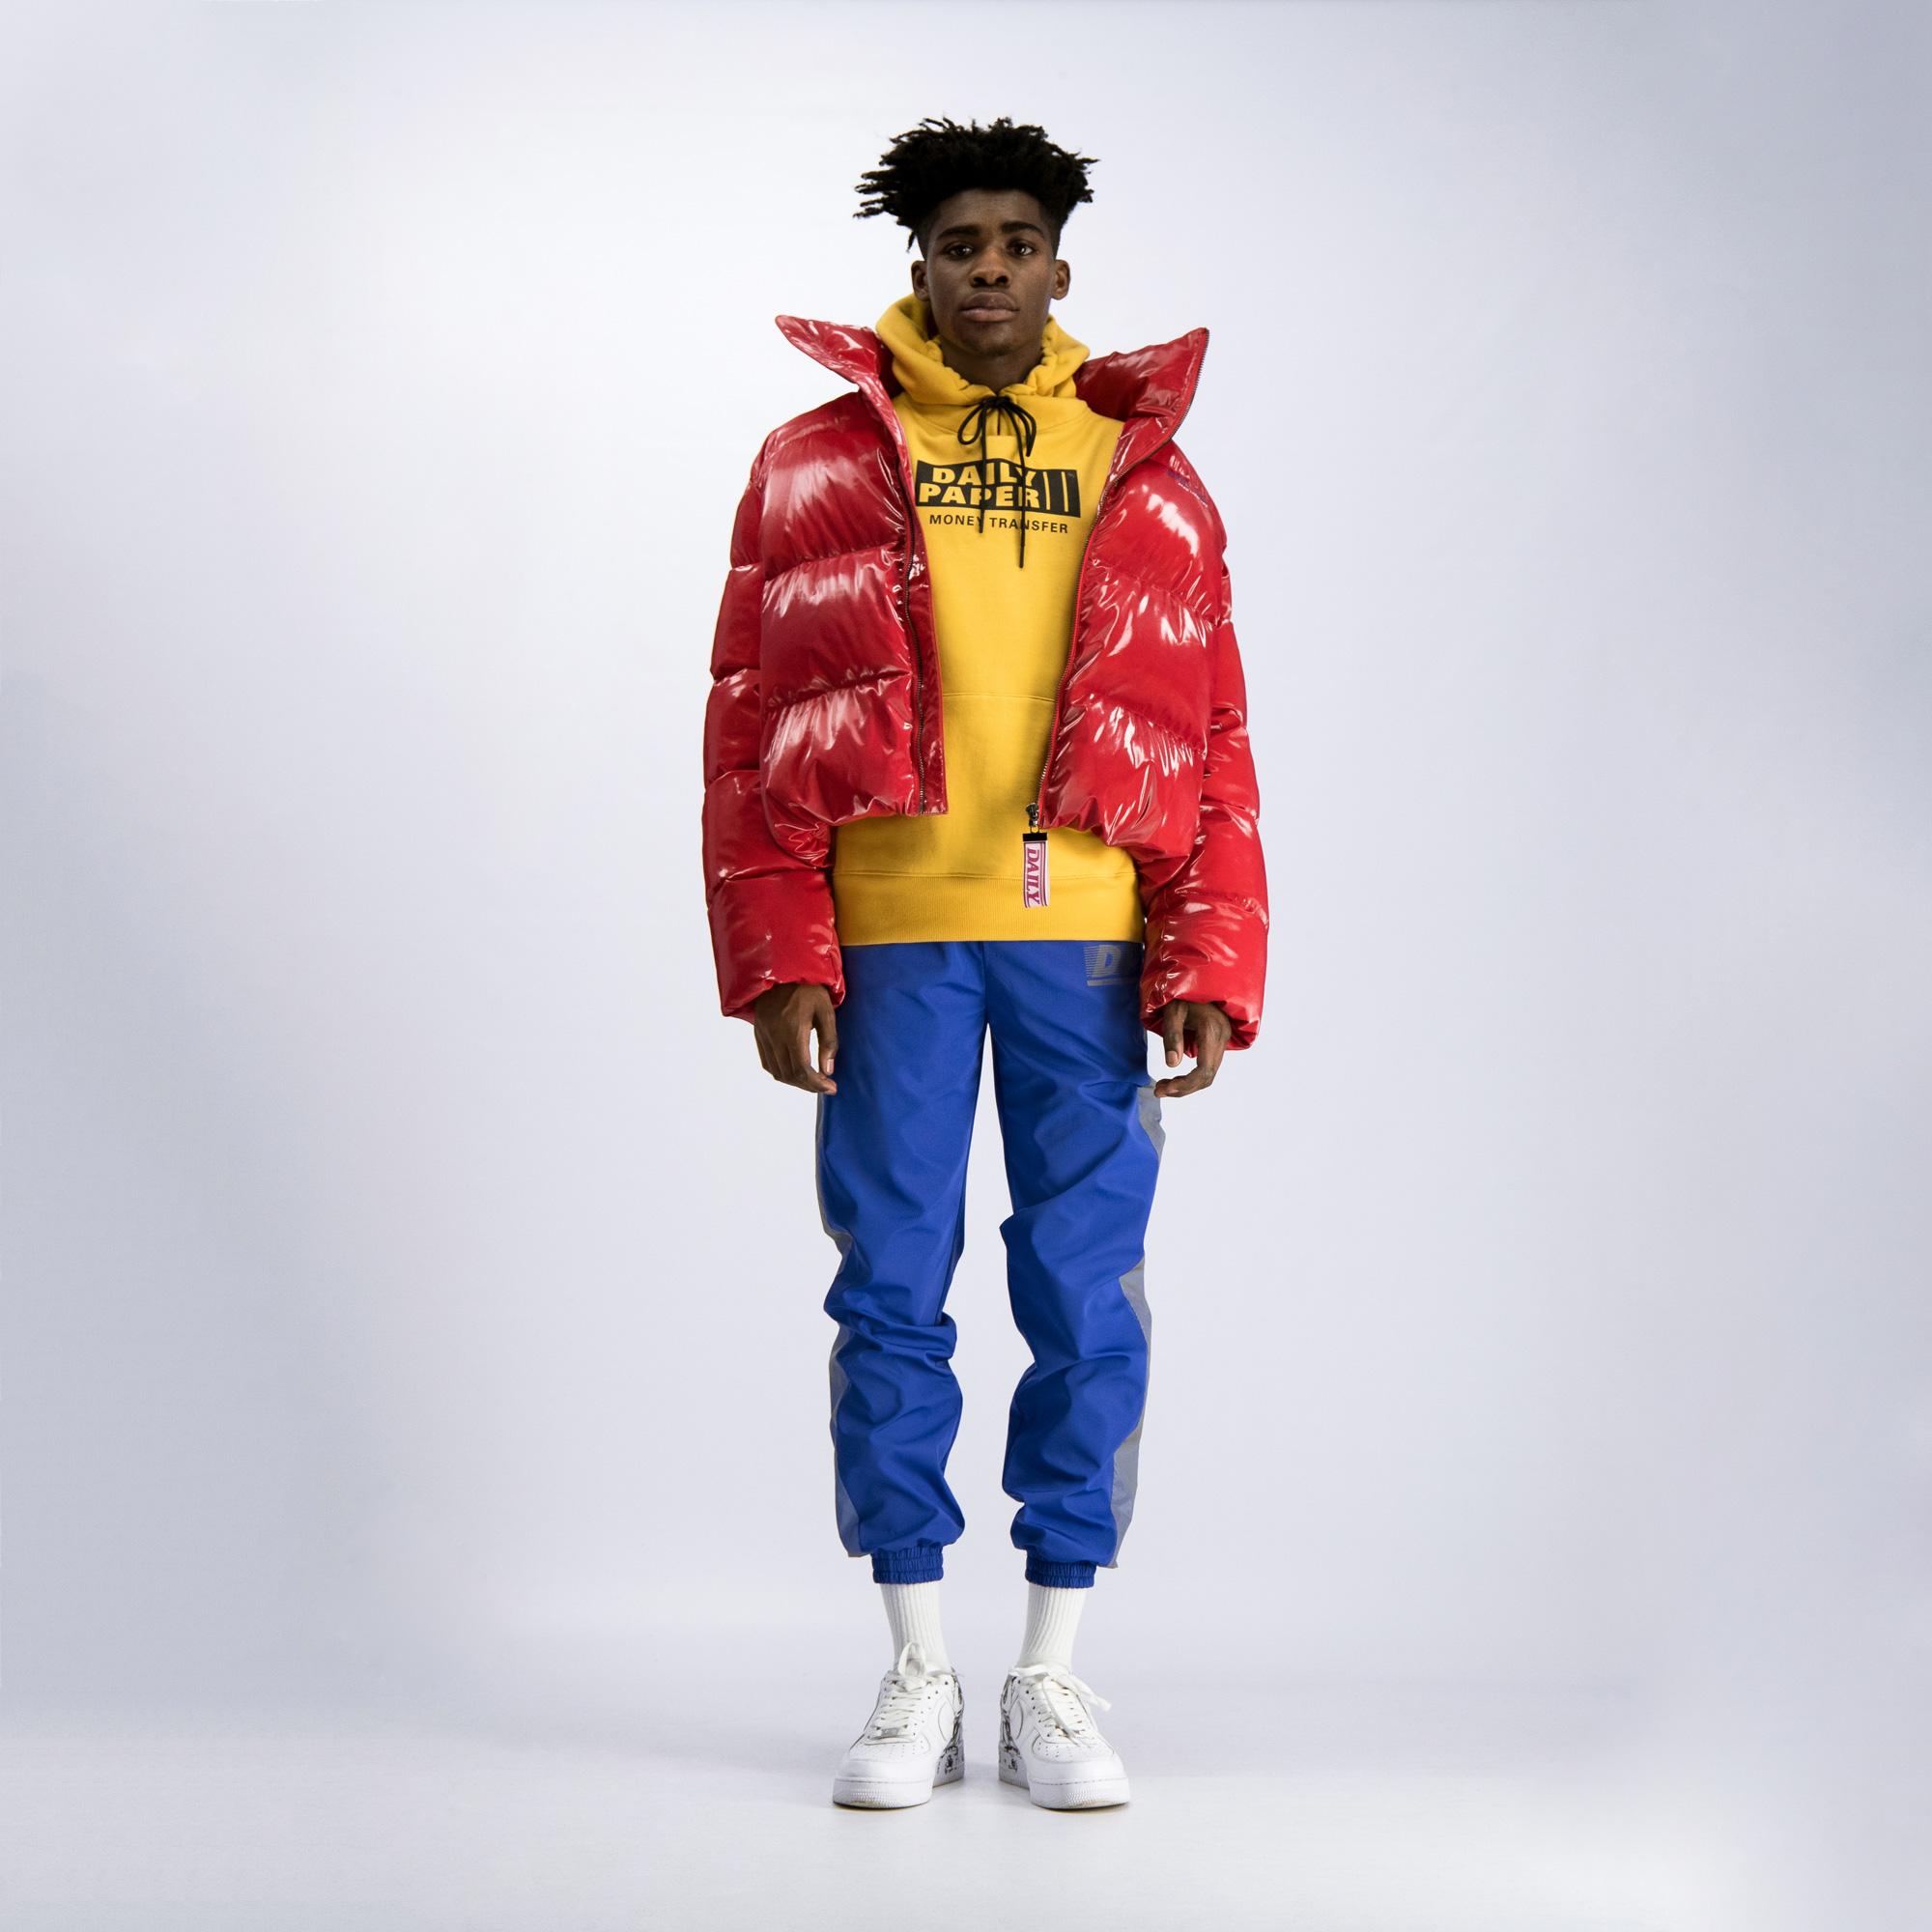 New to – urbanwear